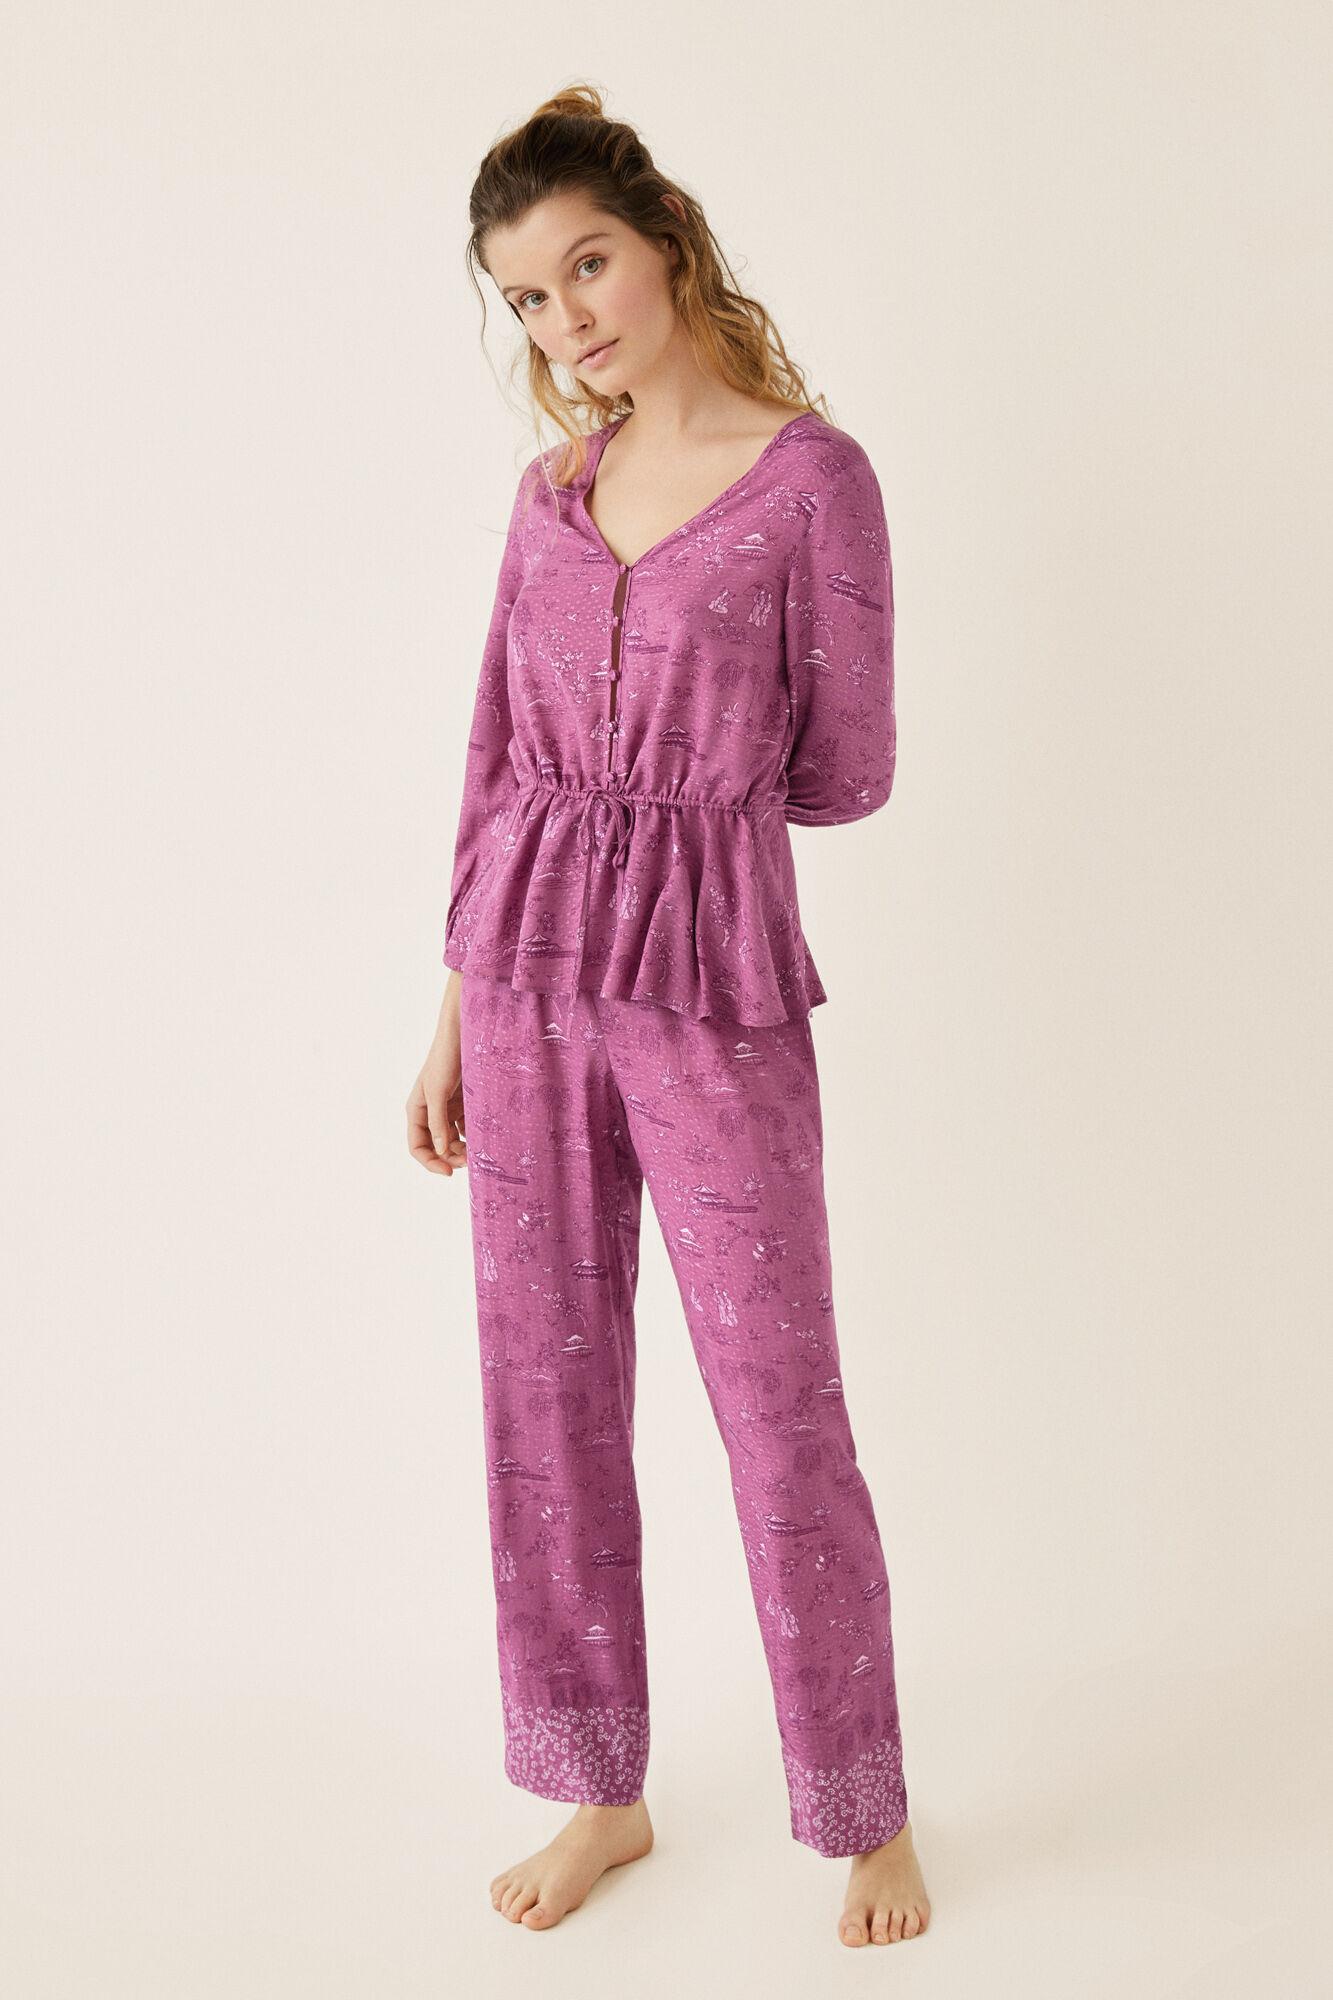 c379ddb79 Pijama largo estampado oriental